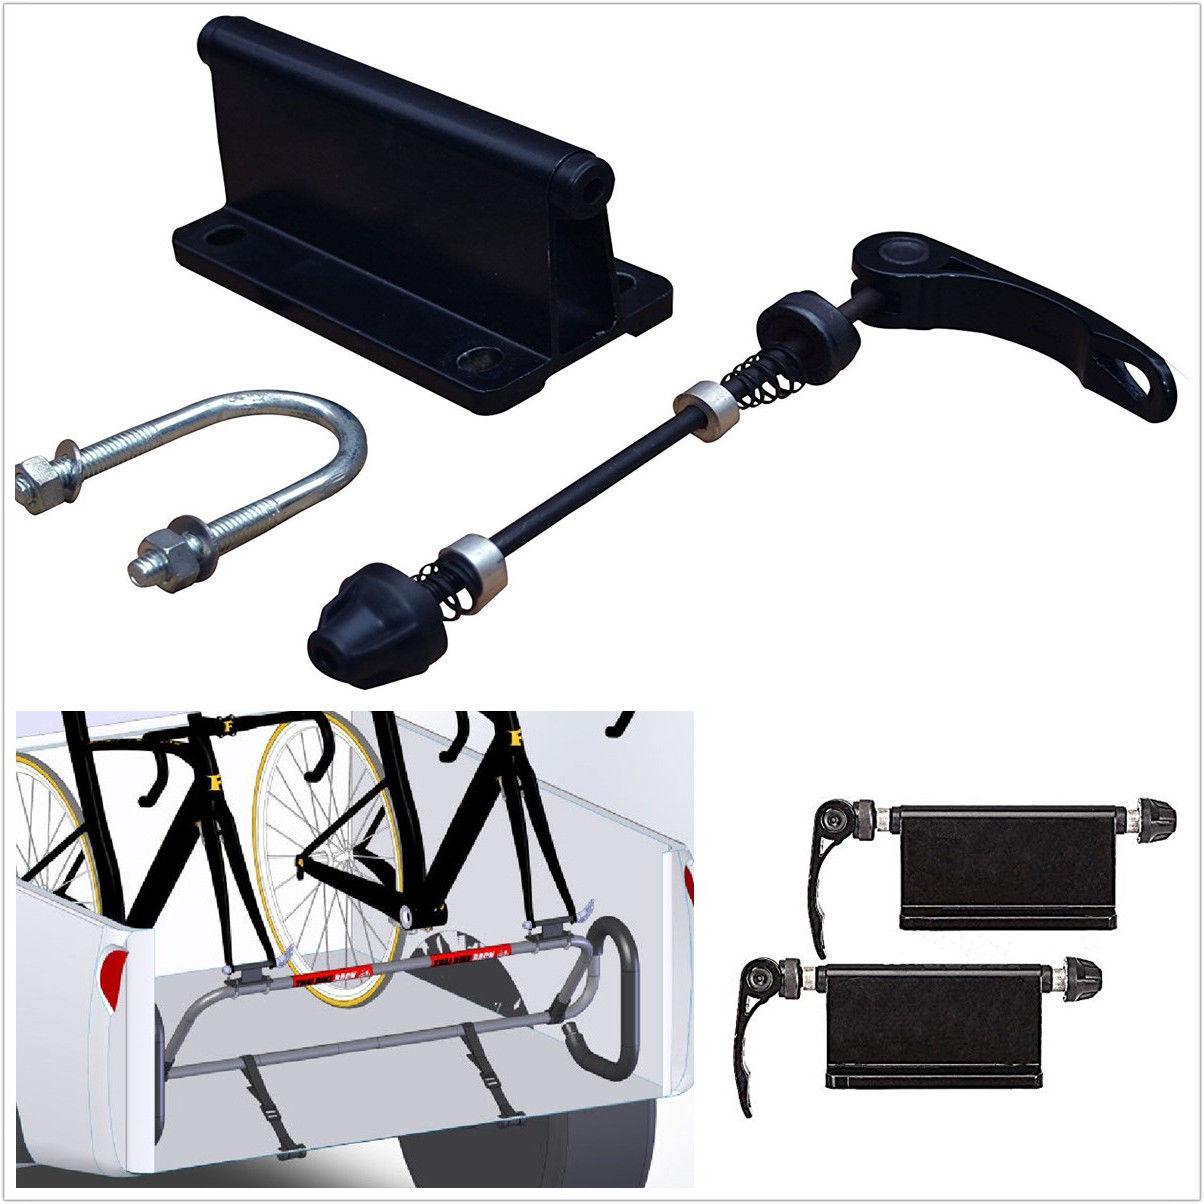 2pcs Black MTB Bike Bicycle Handlebar Grip Smooth Sponge Foam Tube Cover D514